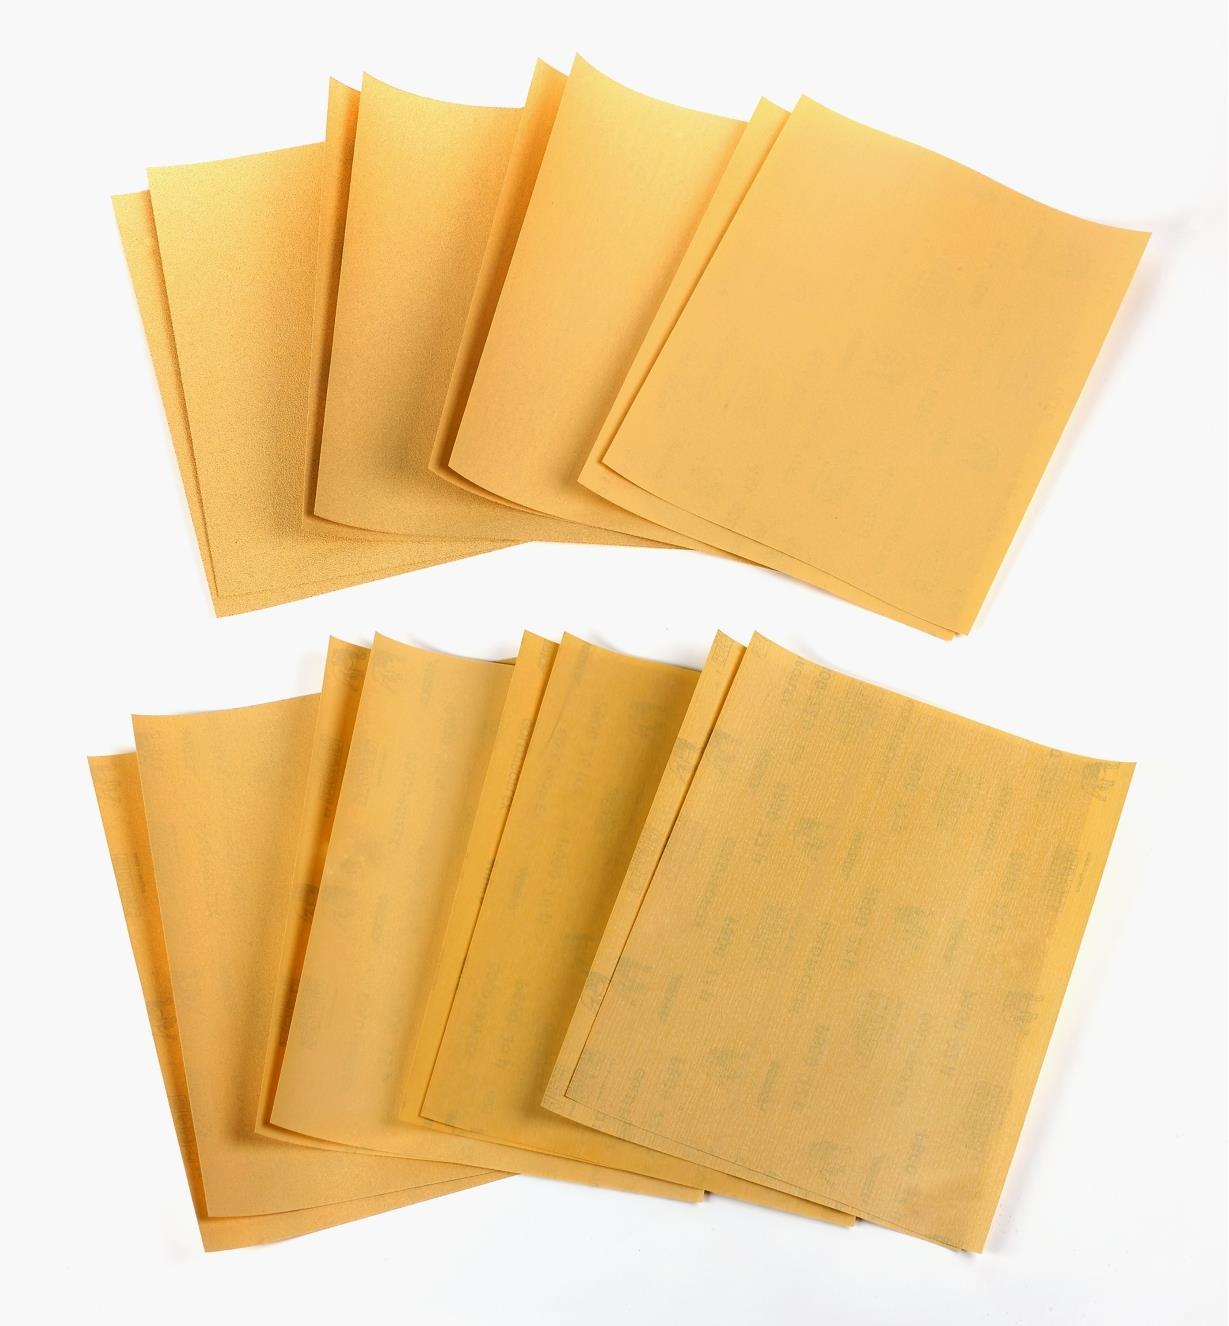 55K9393 - 16-Pc. Mirka Gold Sandpaper Sheet Sampler (80x-800x)